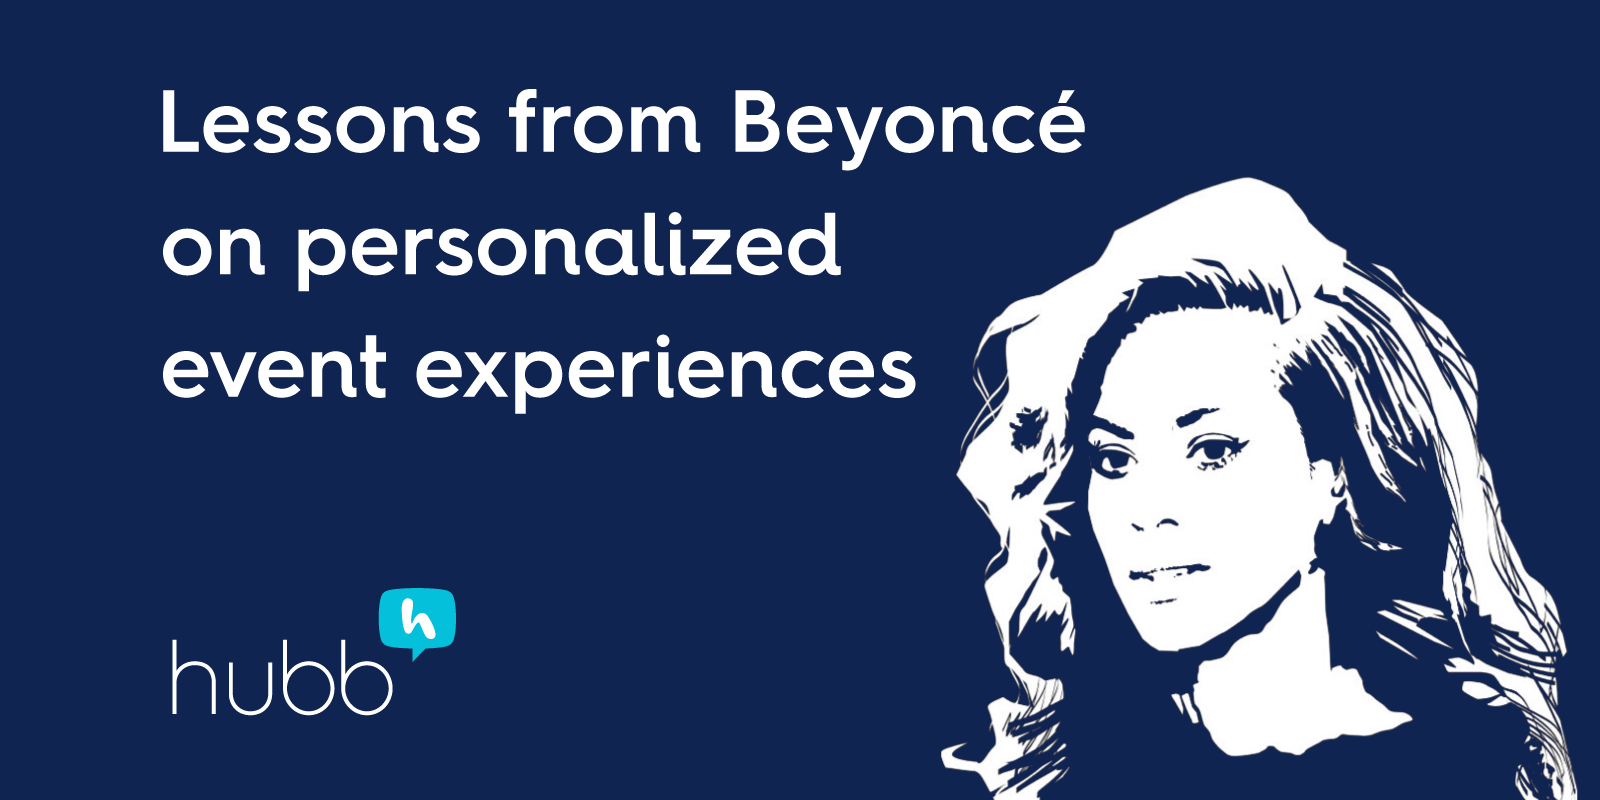 Lessons from Beyoncéon personalized event experiences